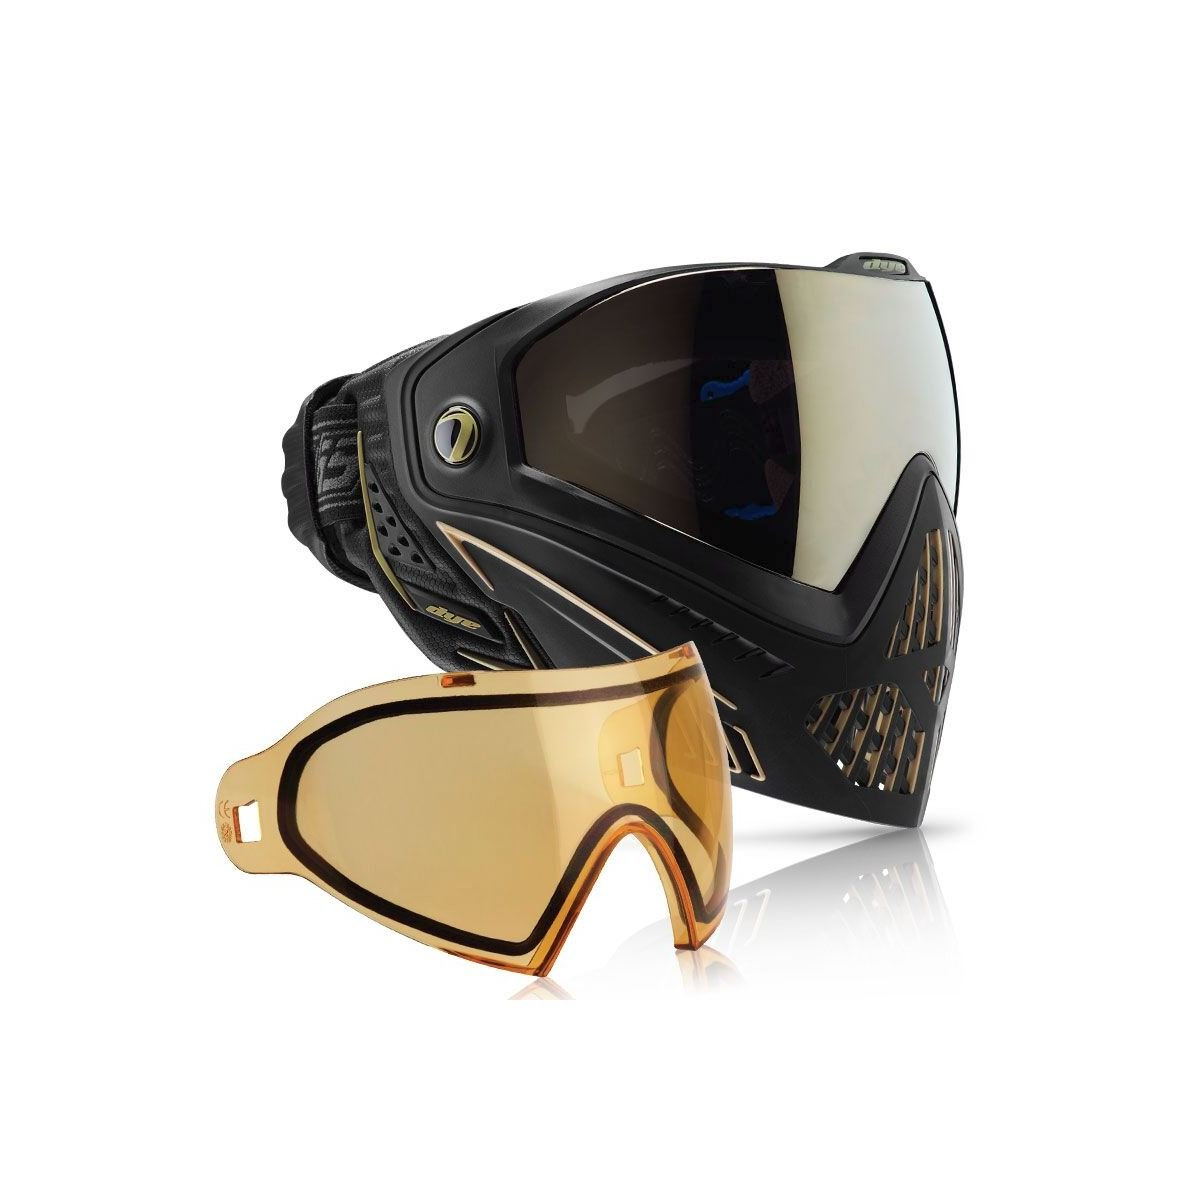 Dye i5ペイントボールGoggle B071Z2JTMR Onyx/Gold i5 With Additional HD Lens Onyx/Gold i5 With Additional HD Lens